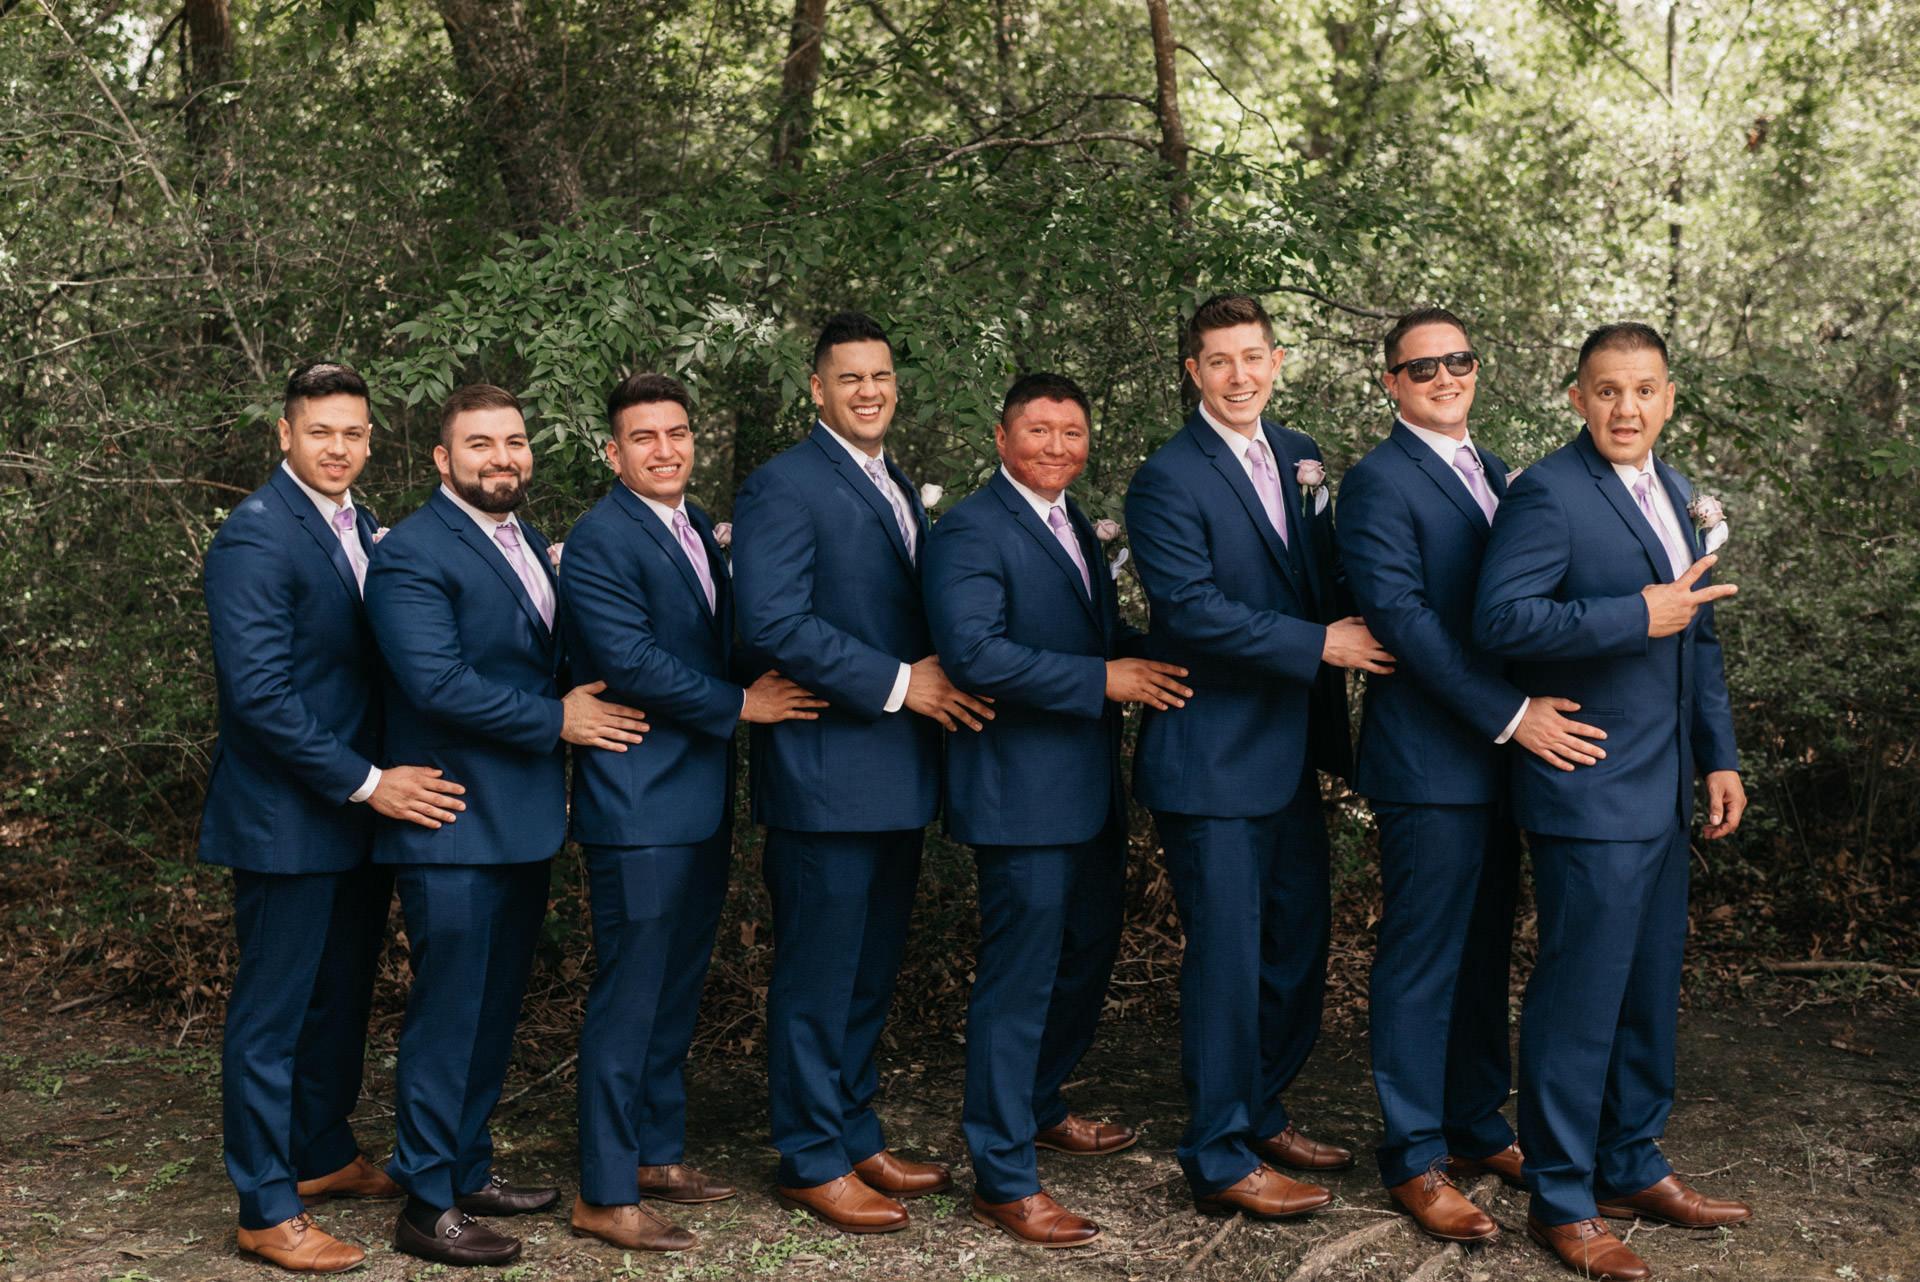 lexi-michael-wedding-blog-sm-39.jpg